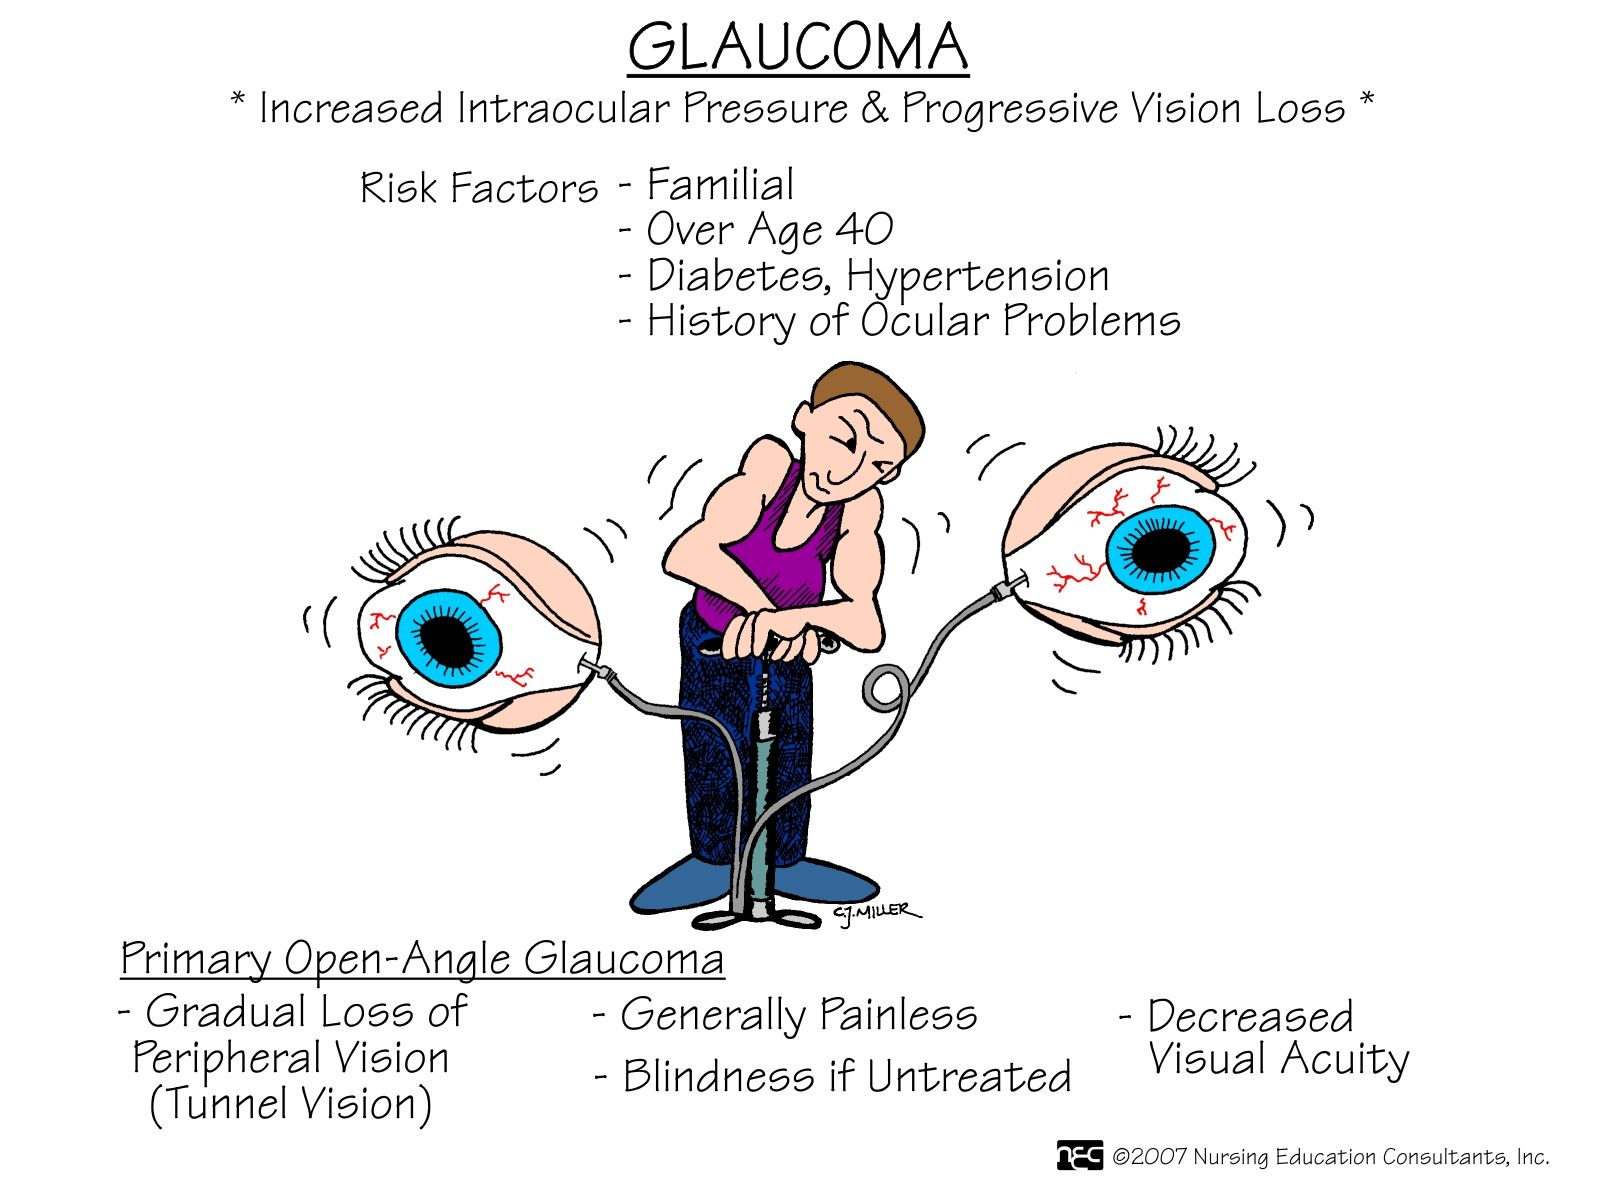 nursing mnemonics and tips   optic nerve, eye and school